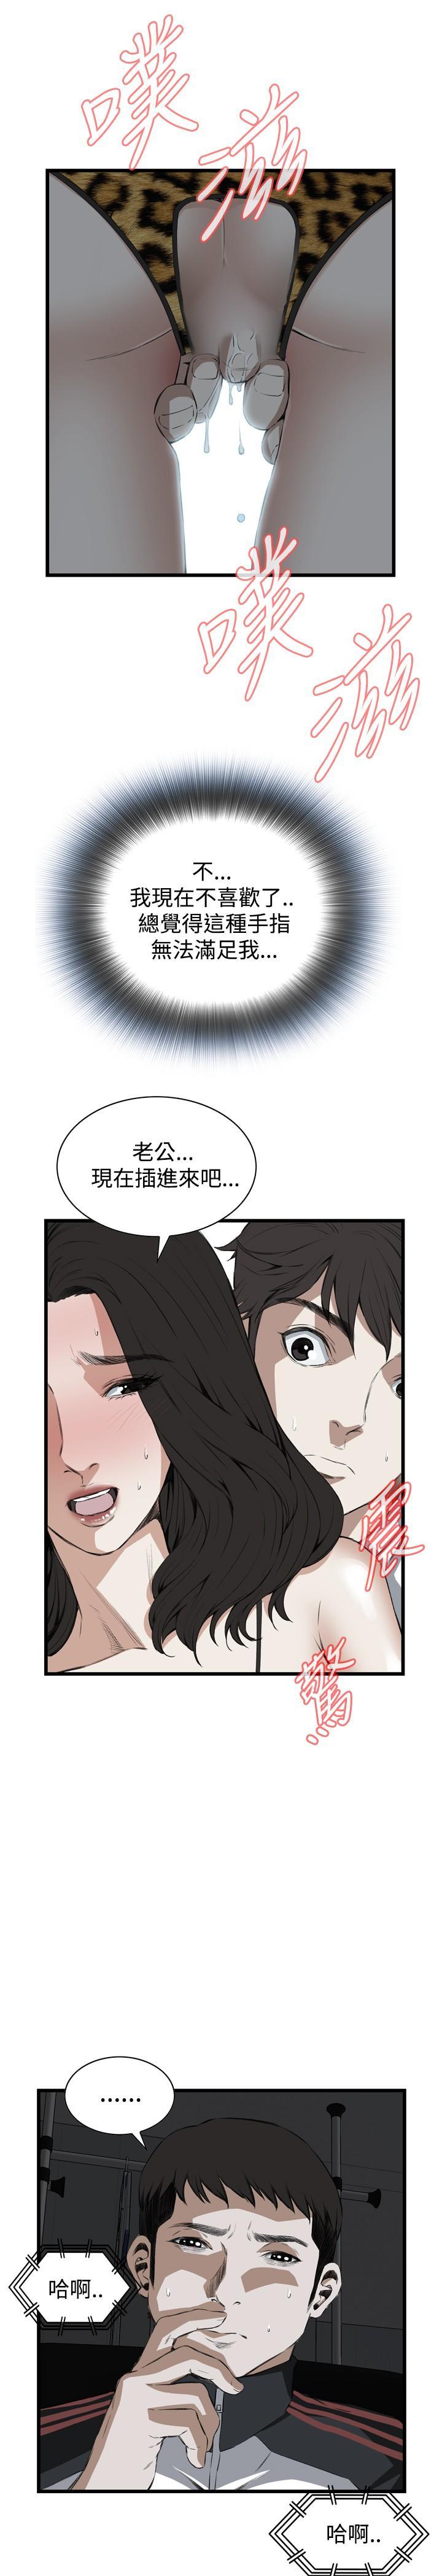 Take a Peek 偷窥 Ch.39~60 [Chinese]中文 444